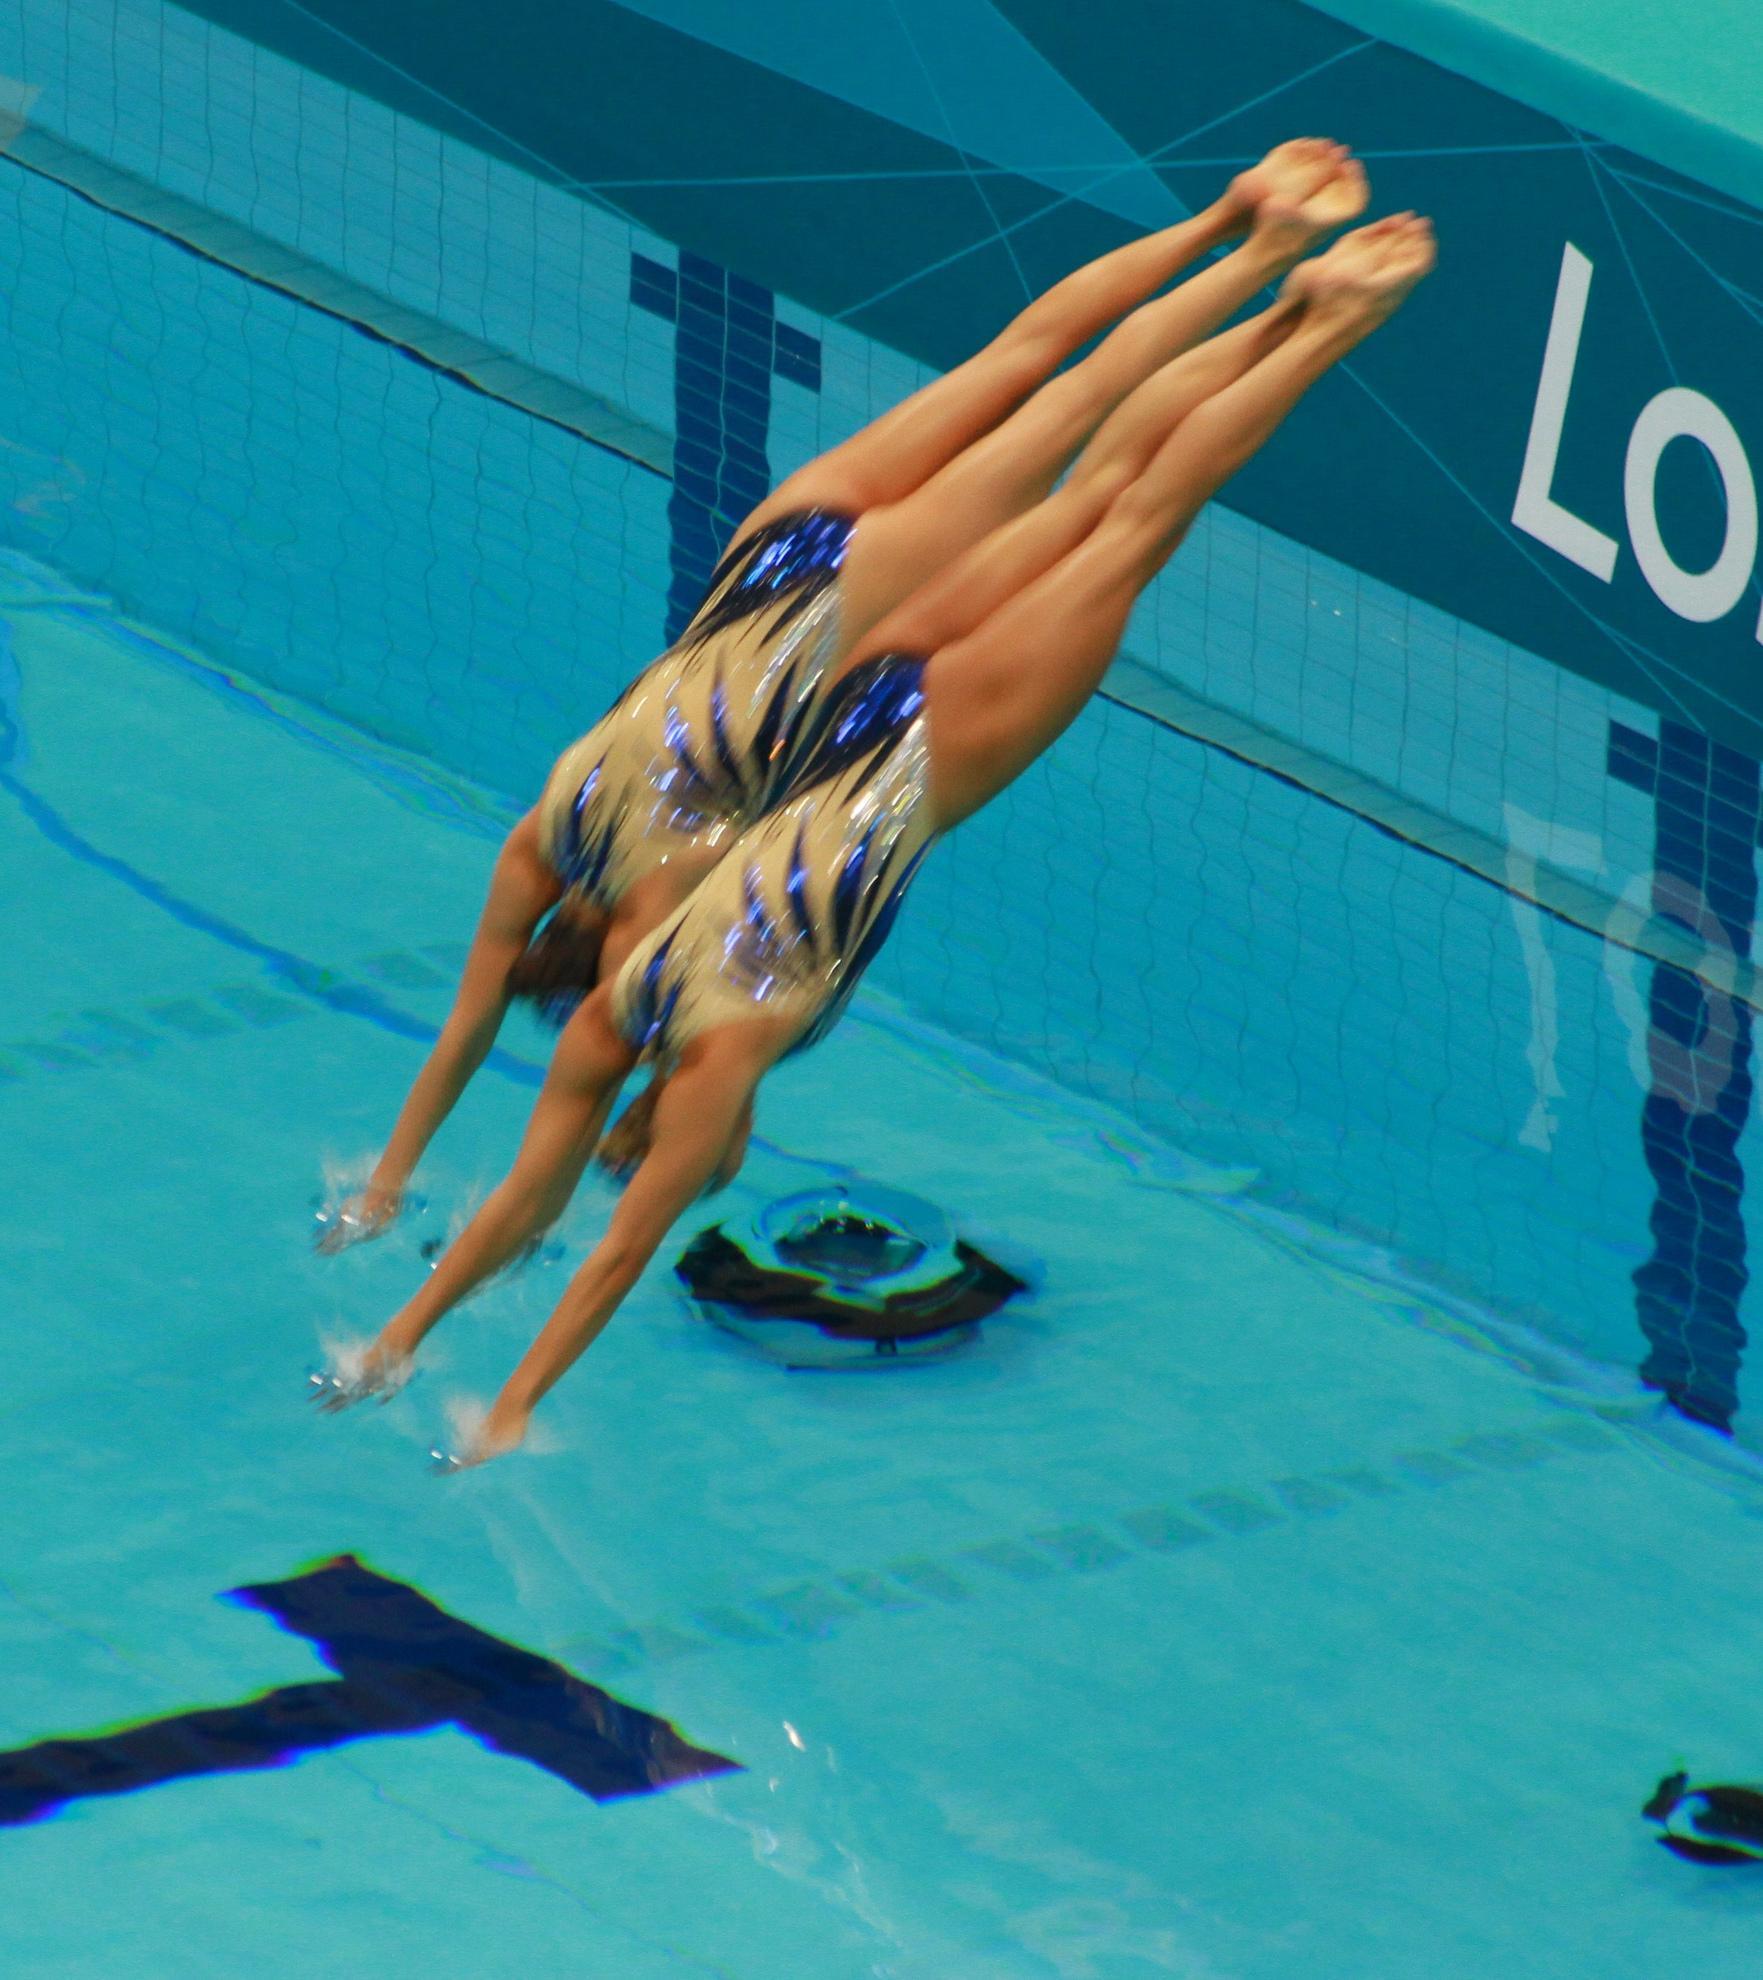 547009111_GreatBritainSynchronisedSwimming24_122_419lo.jpg